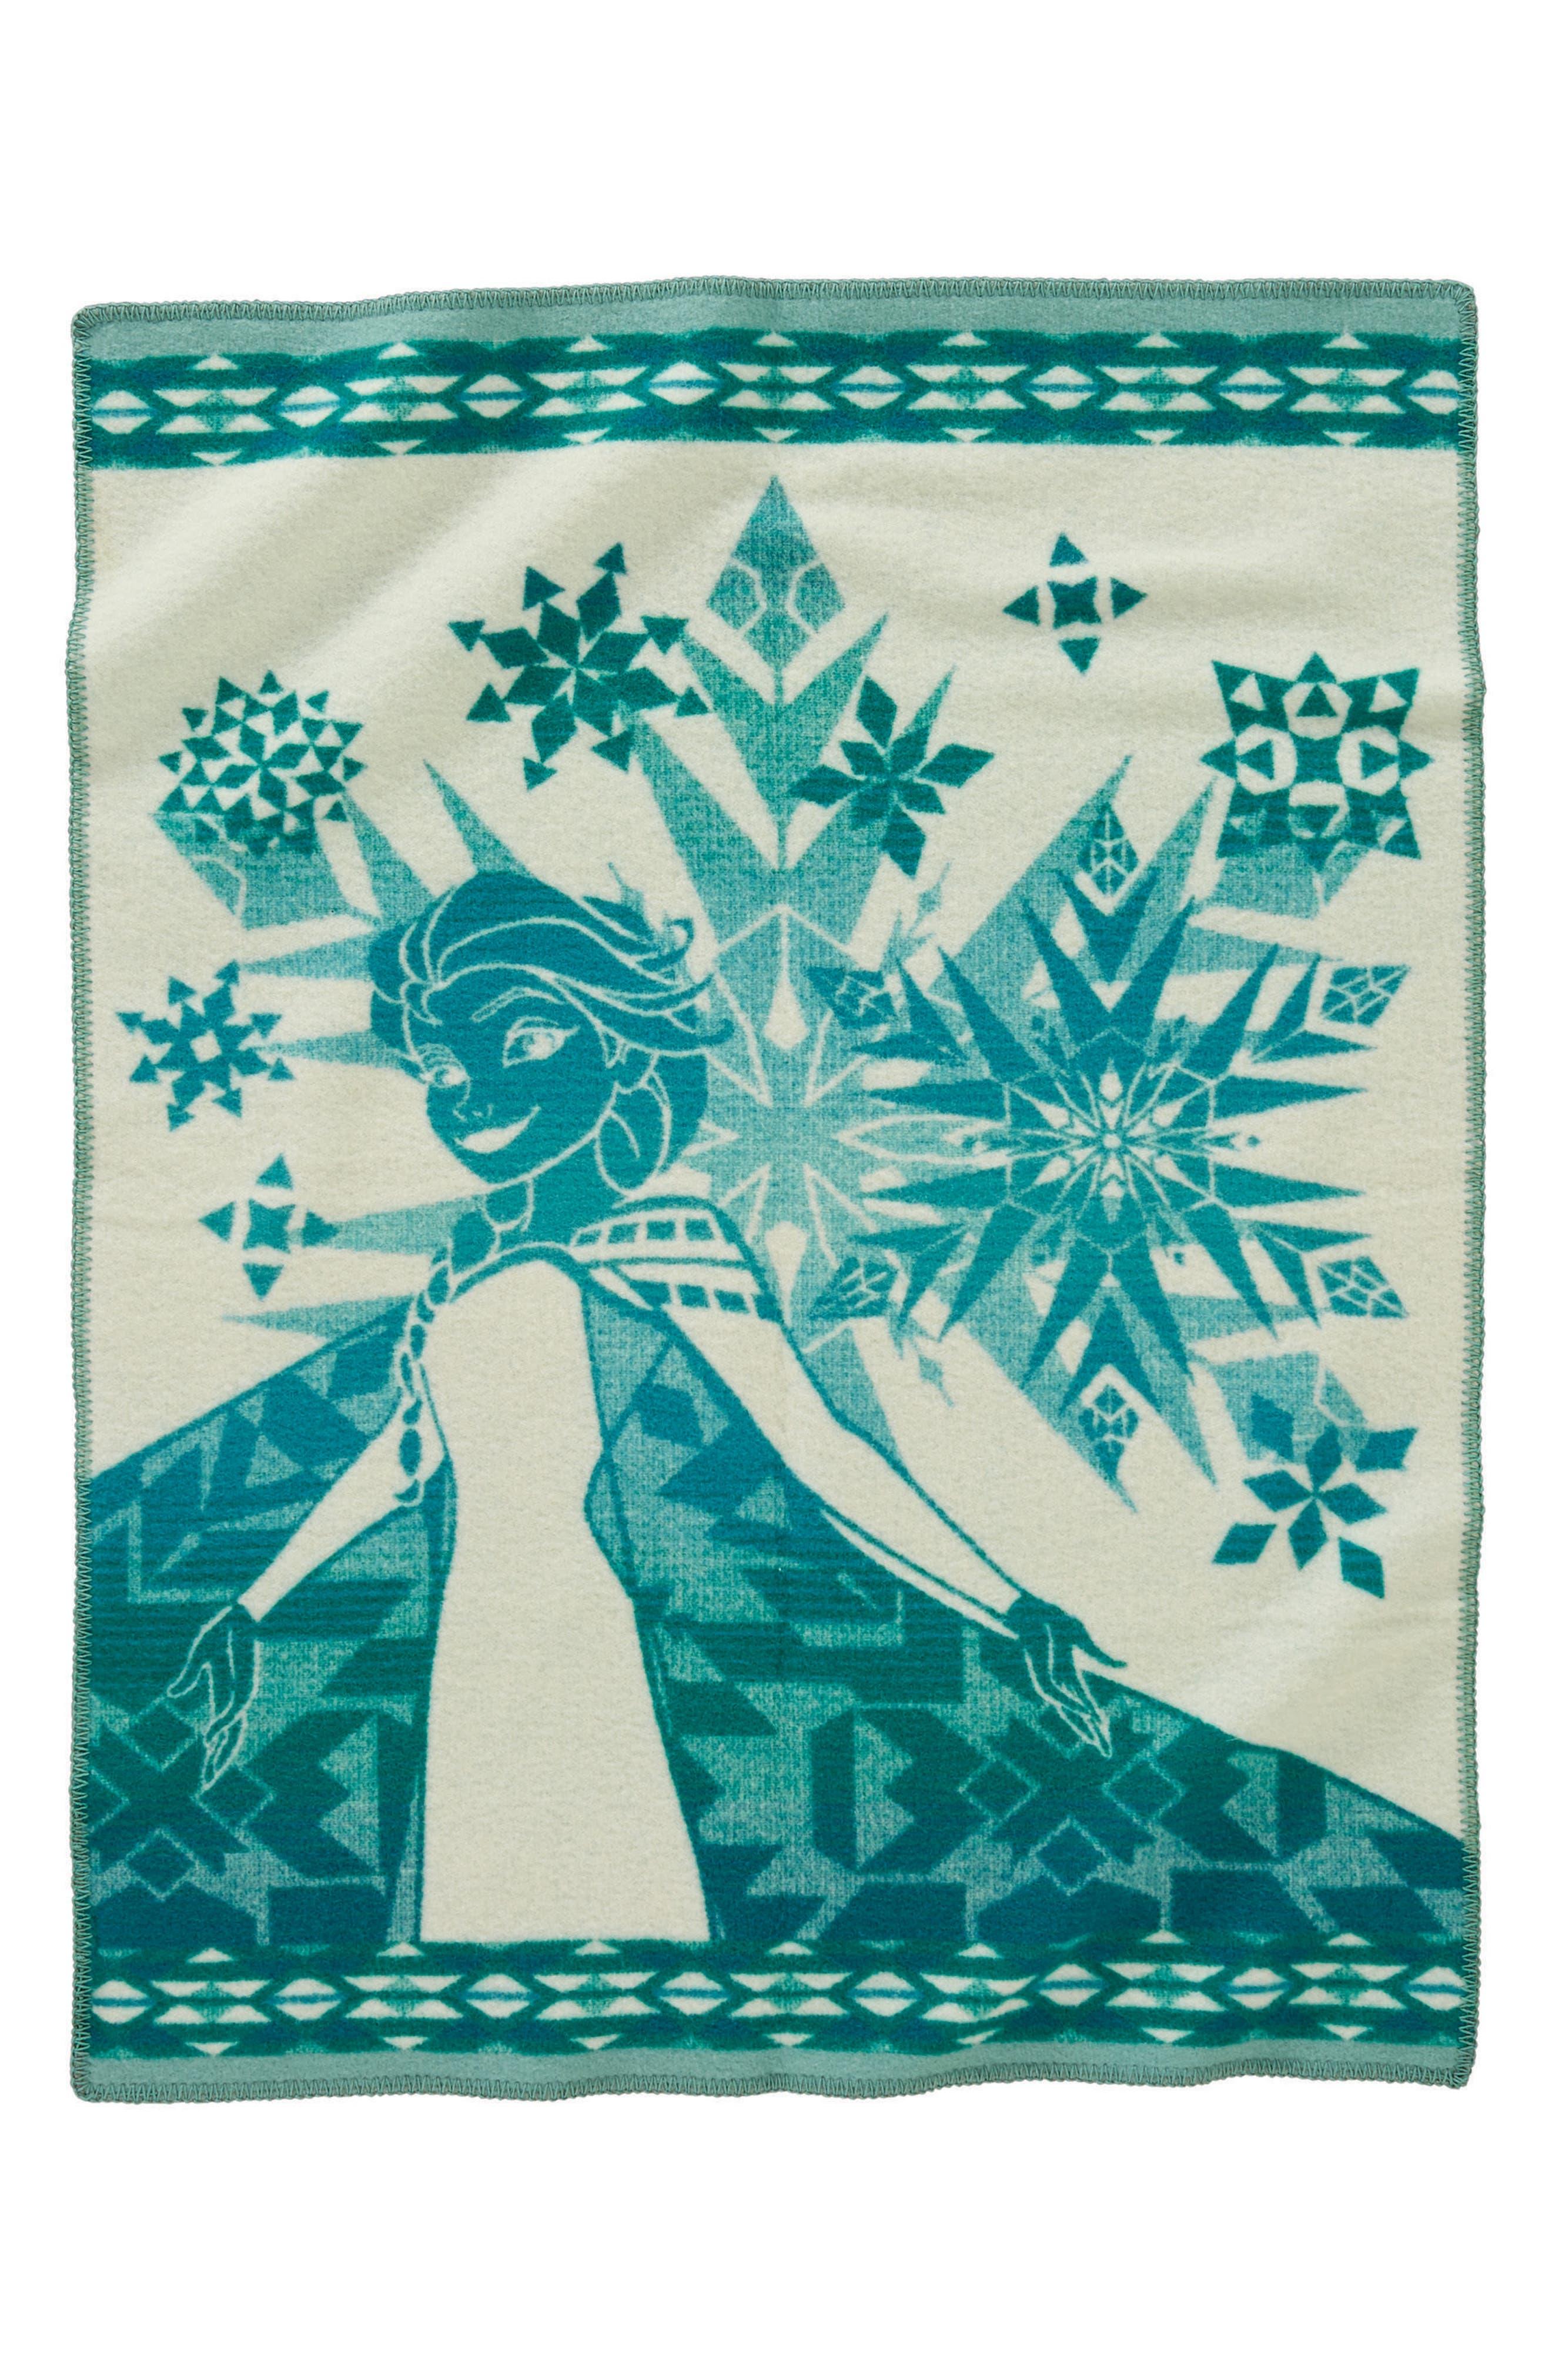 Elsa's Courage Blanket Throw,                             Alternate thumbnail 2, color,                             Green